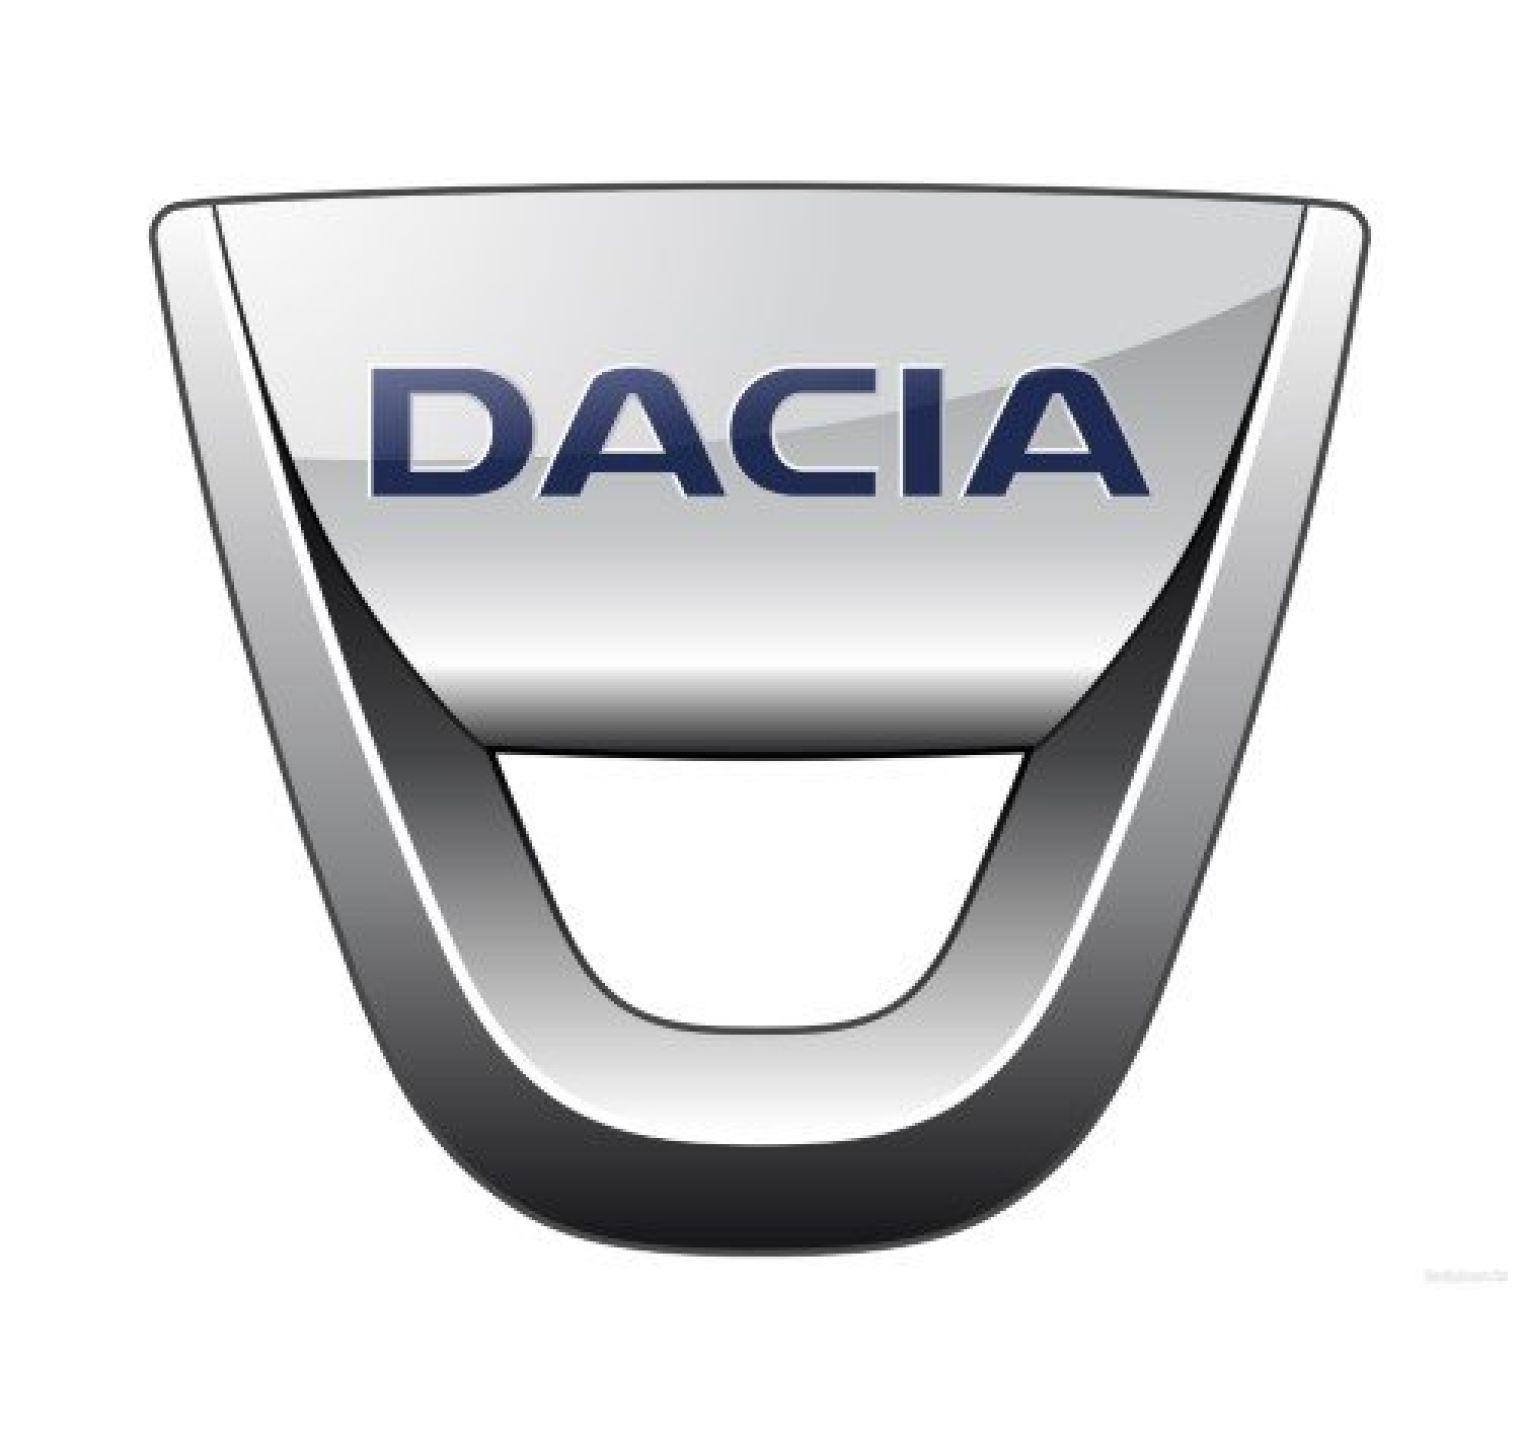 Dacia Sandero II (vanaf 2012) - achterruitenwisser Valeo Silencio flatblade